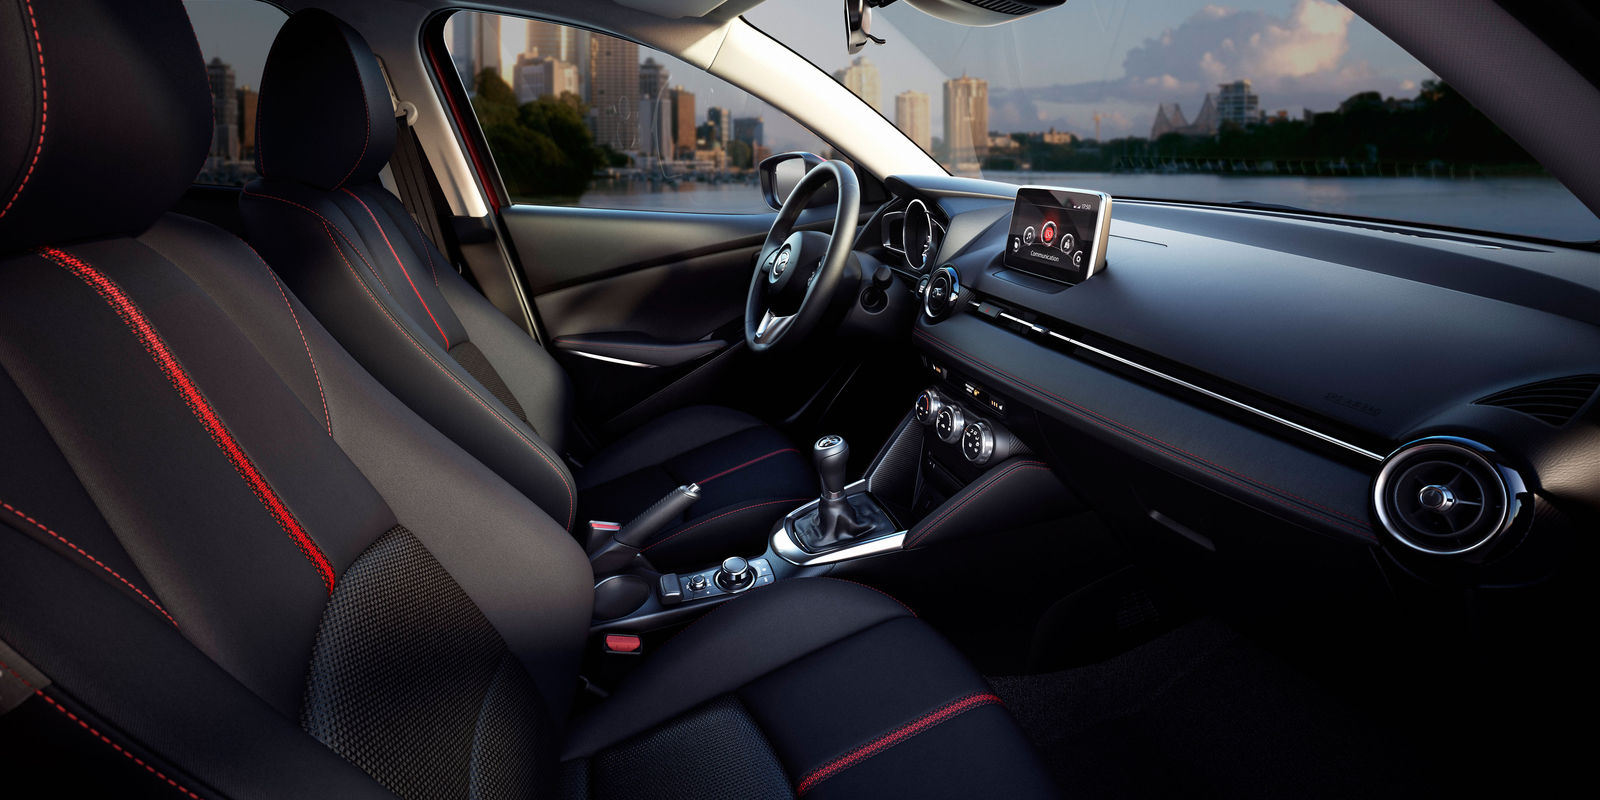 2015 mazda 6 manual transmission review